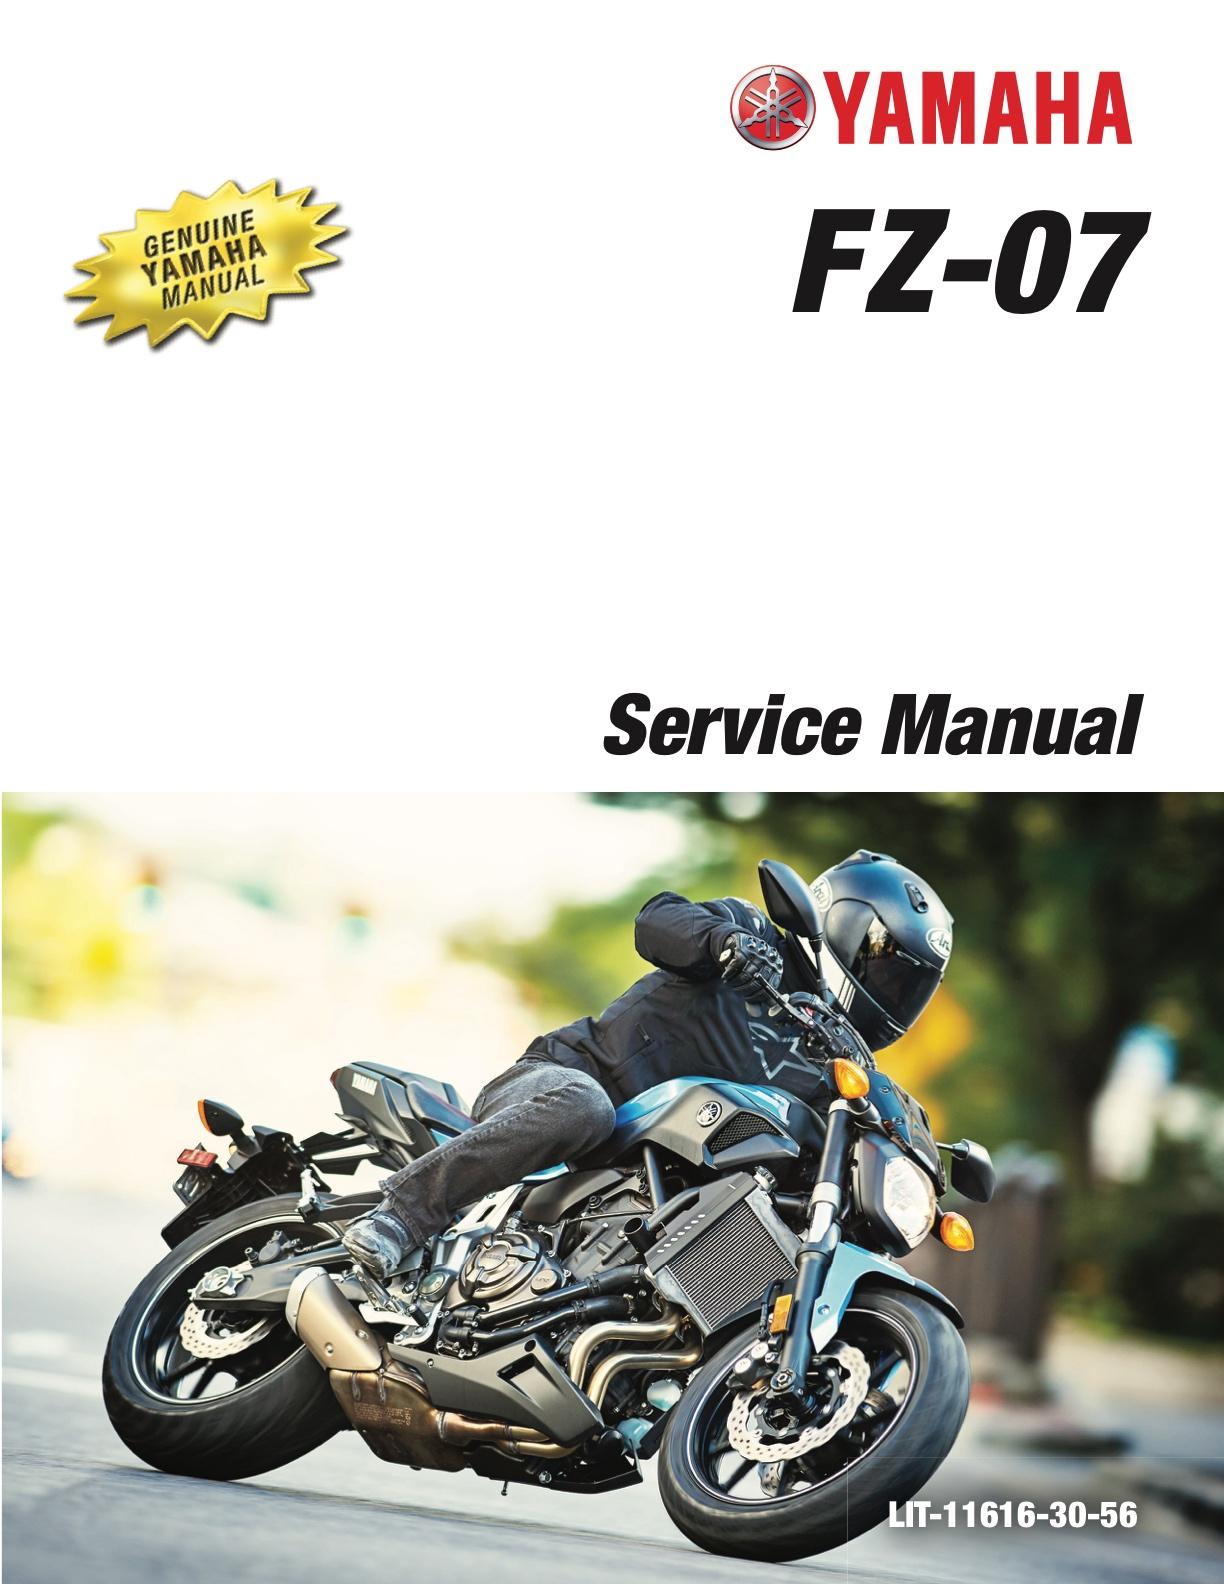 yamaha fz07 abs mt07 abs 2017 workshop repair service manual rh yamaha manuals cc 2006 Yamaha G22E Service Manual 2006 Yamaha G22E Service Manual